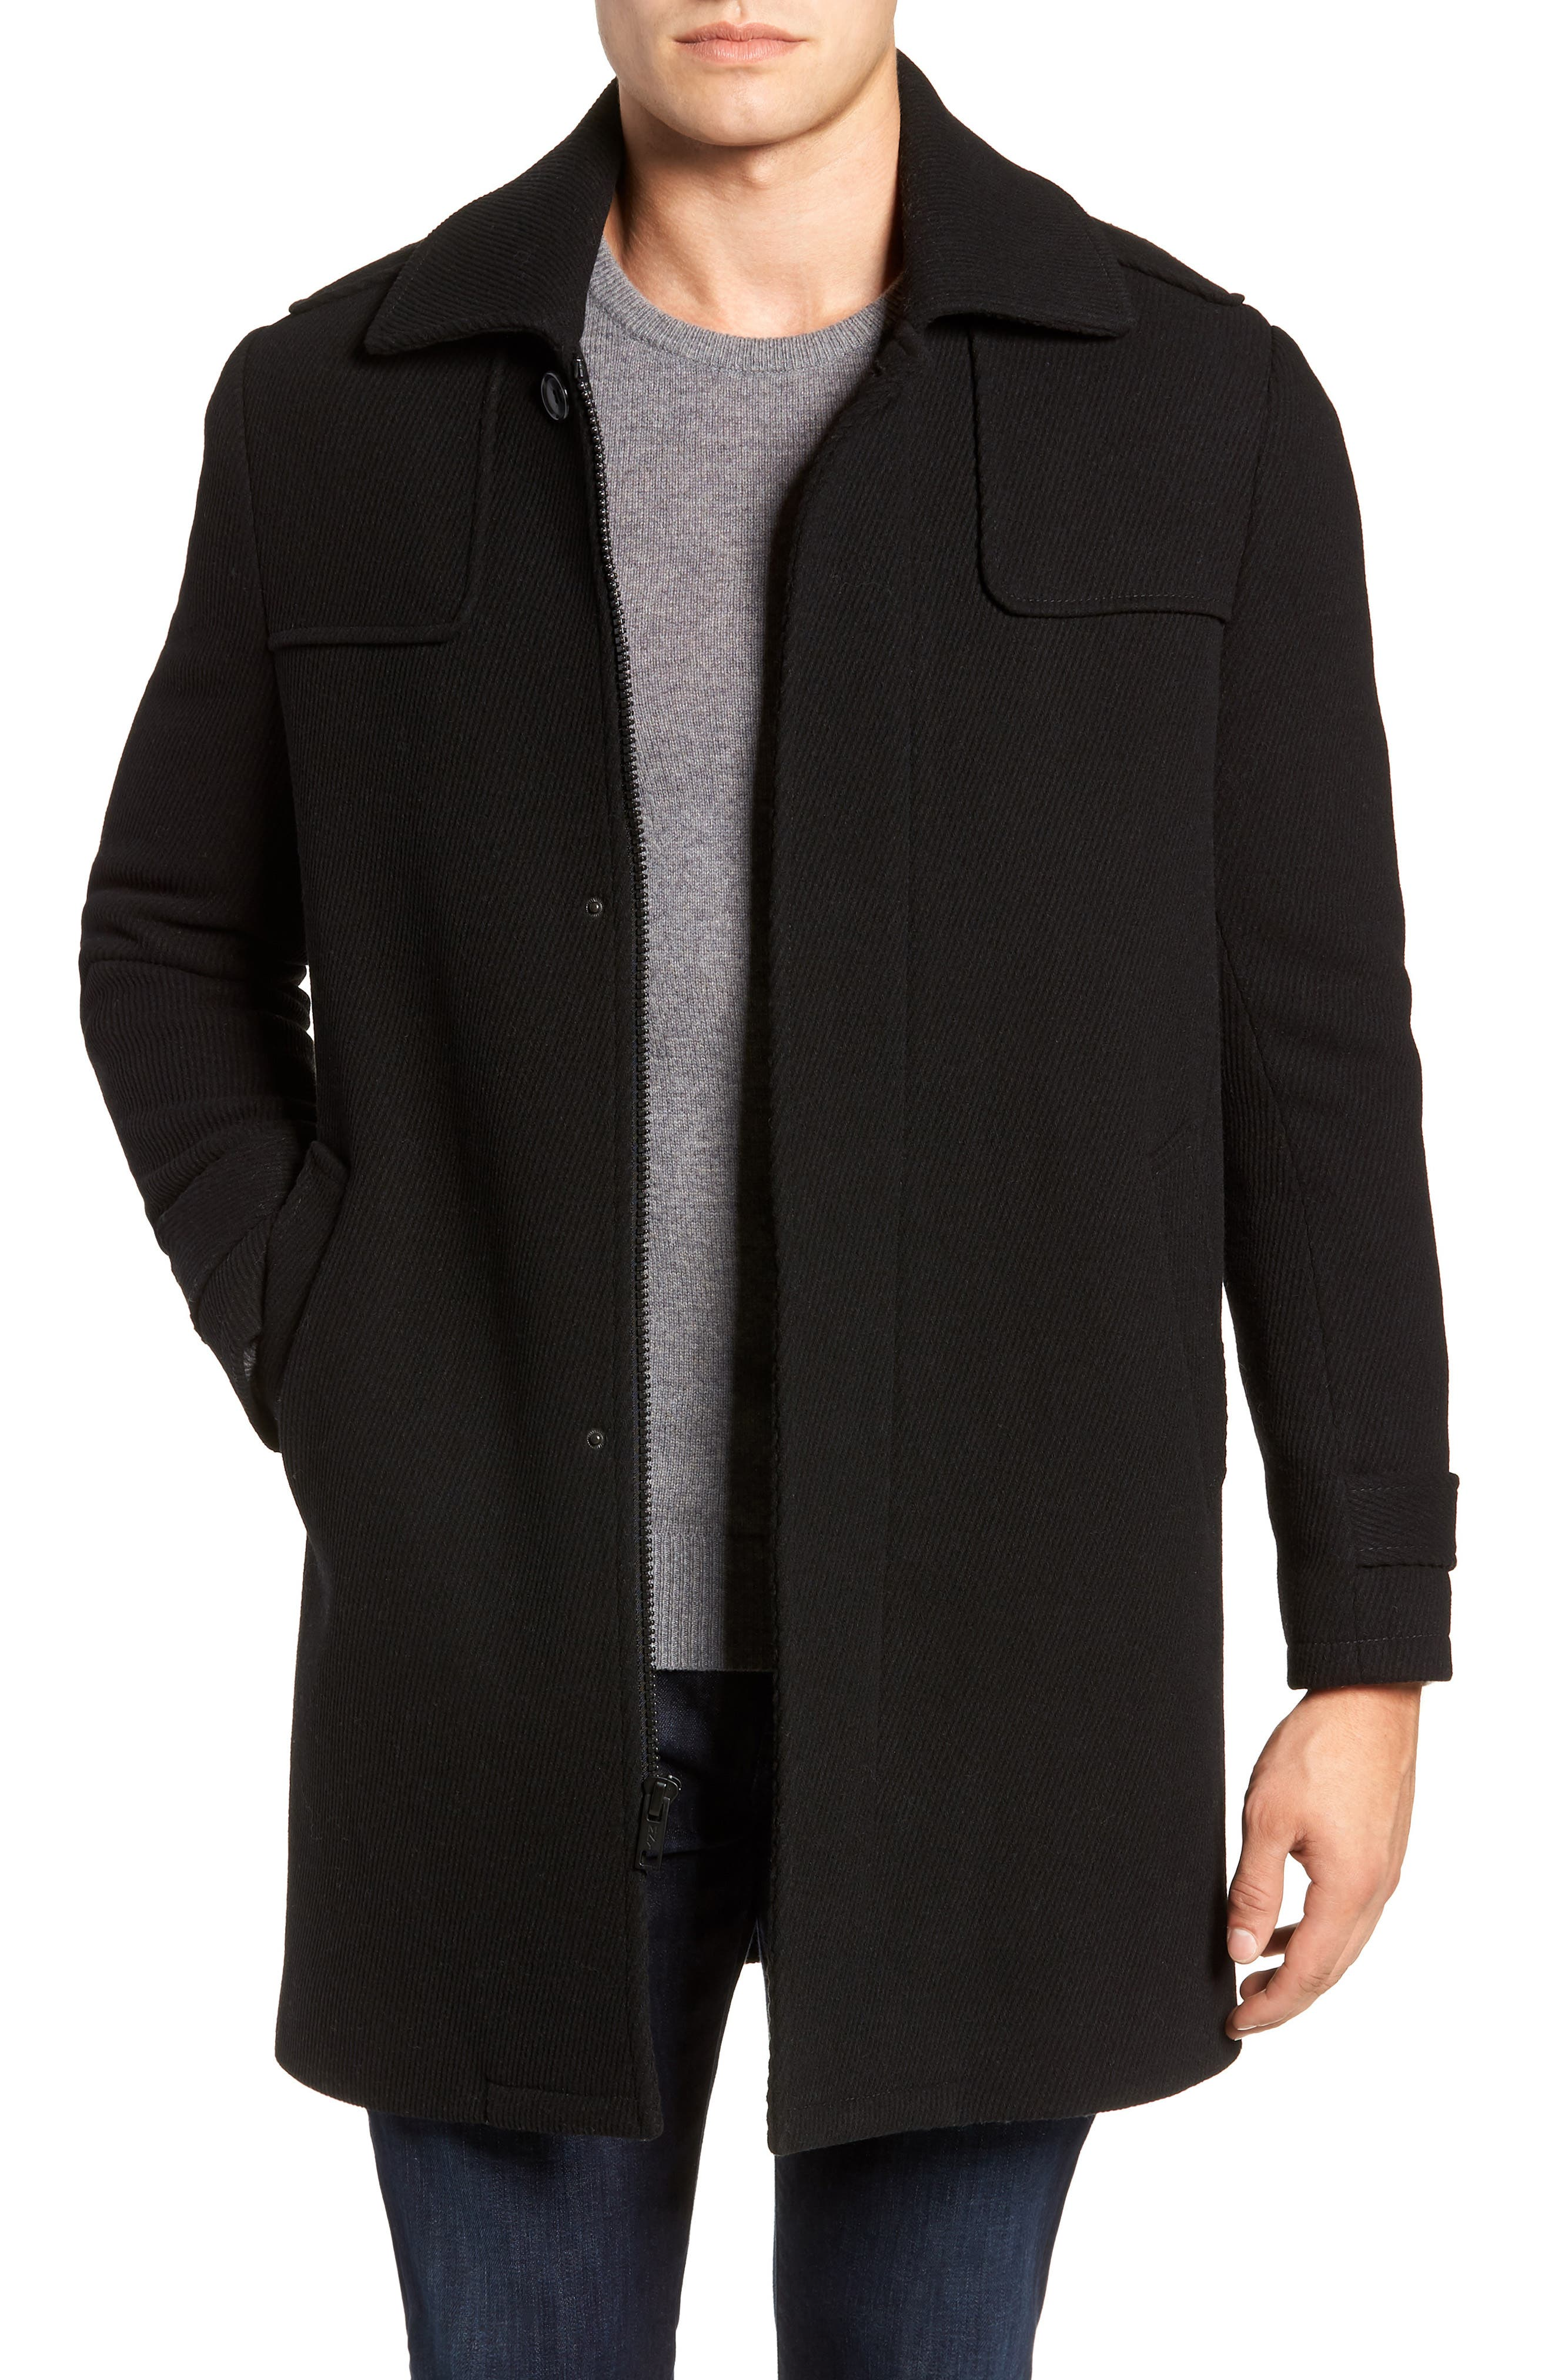 MARC NEW YORK Edmund Wool Blend Twill Car Coat, Main, color, BLACK